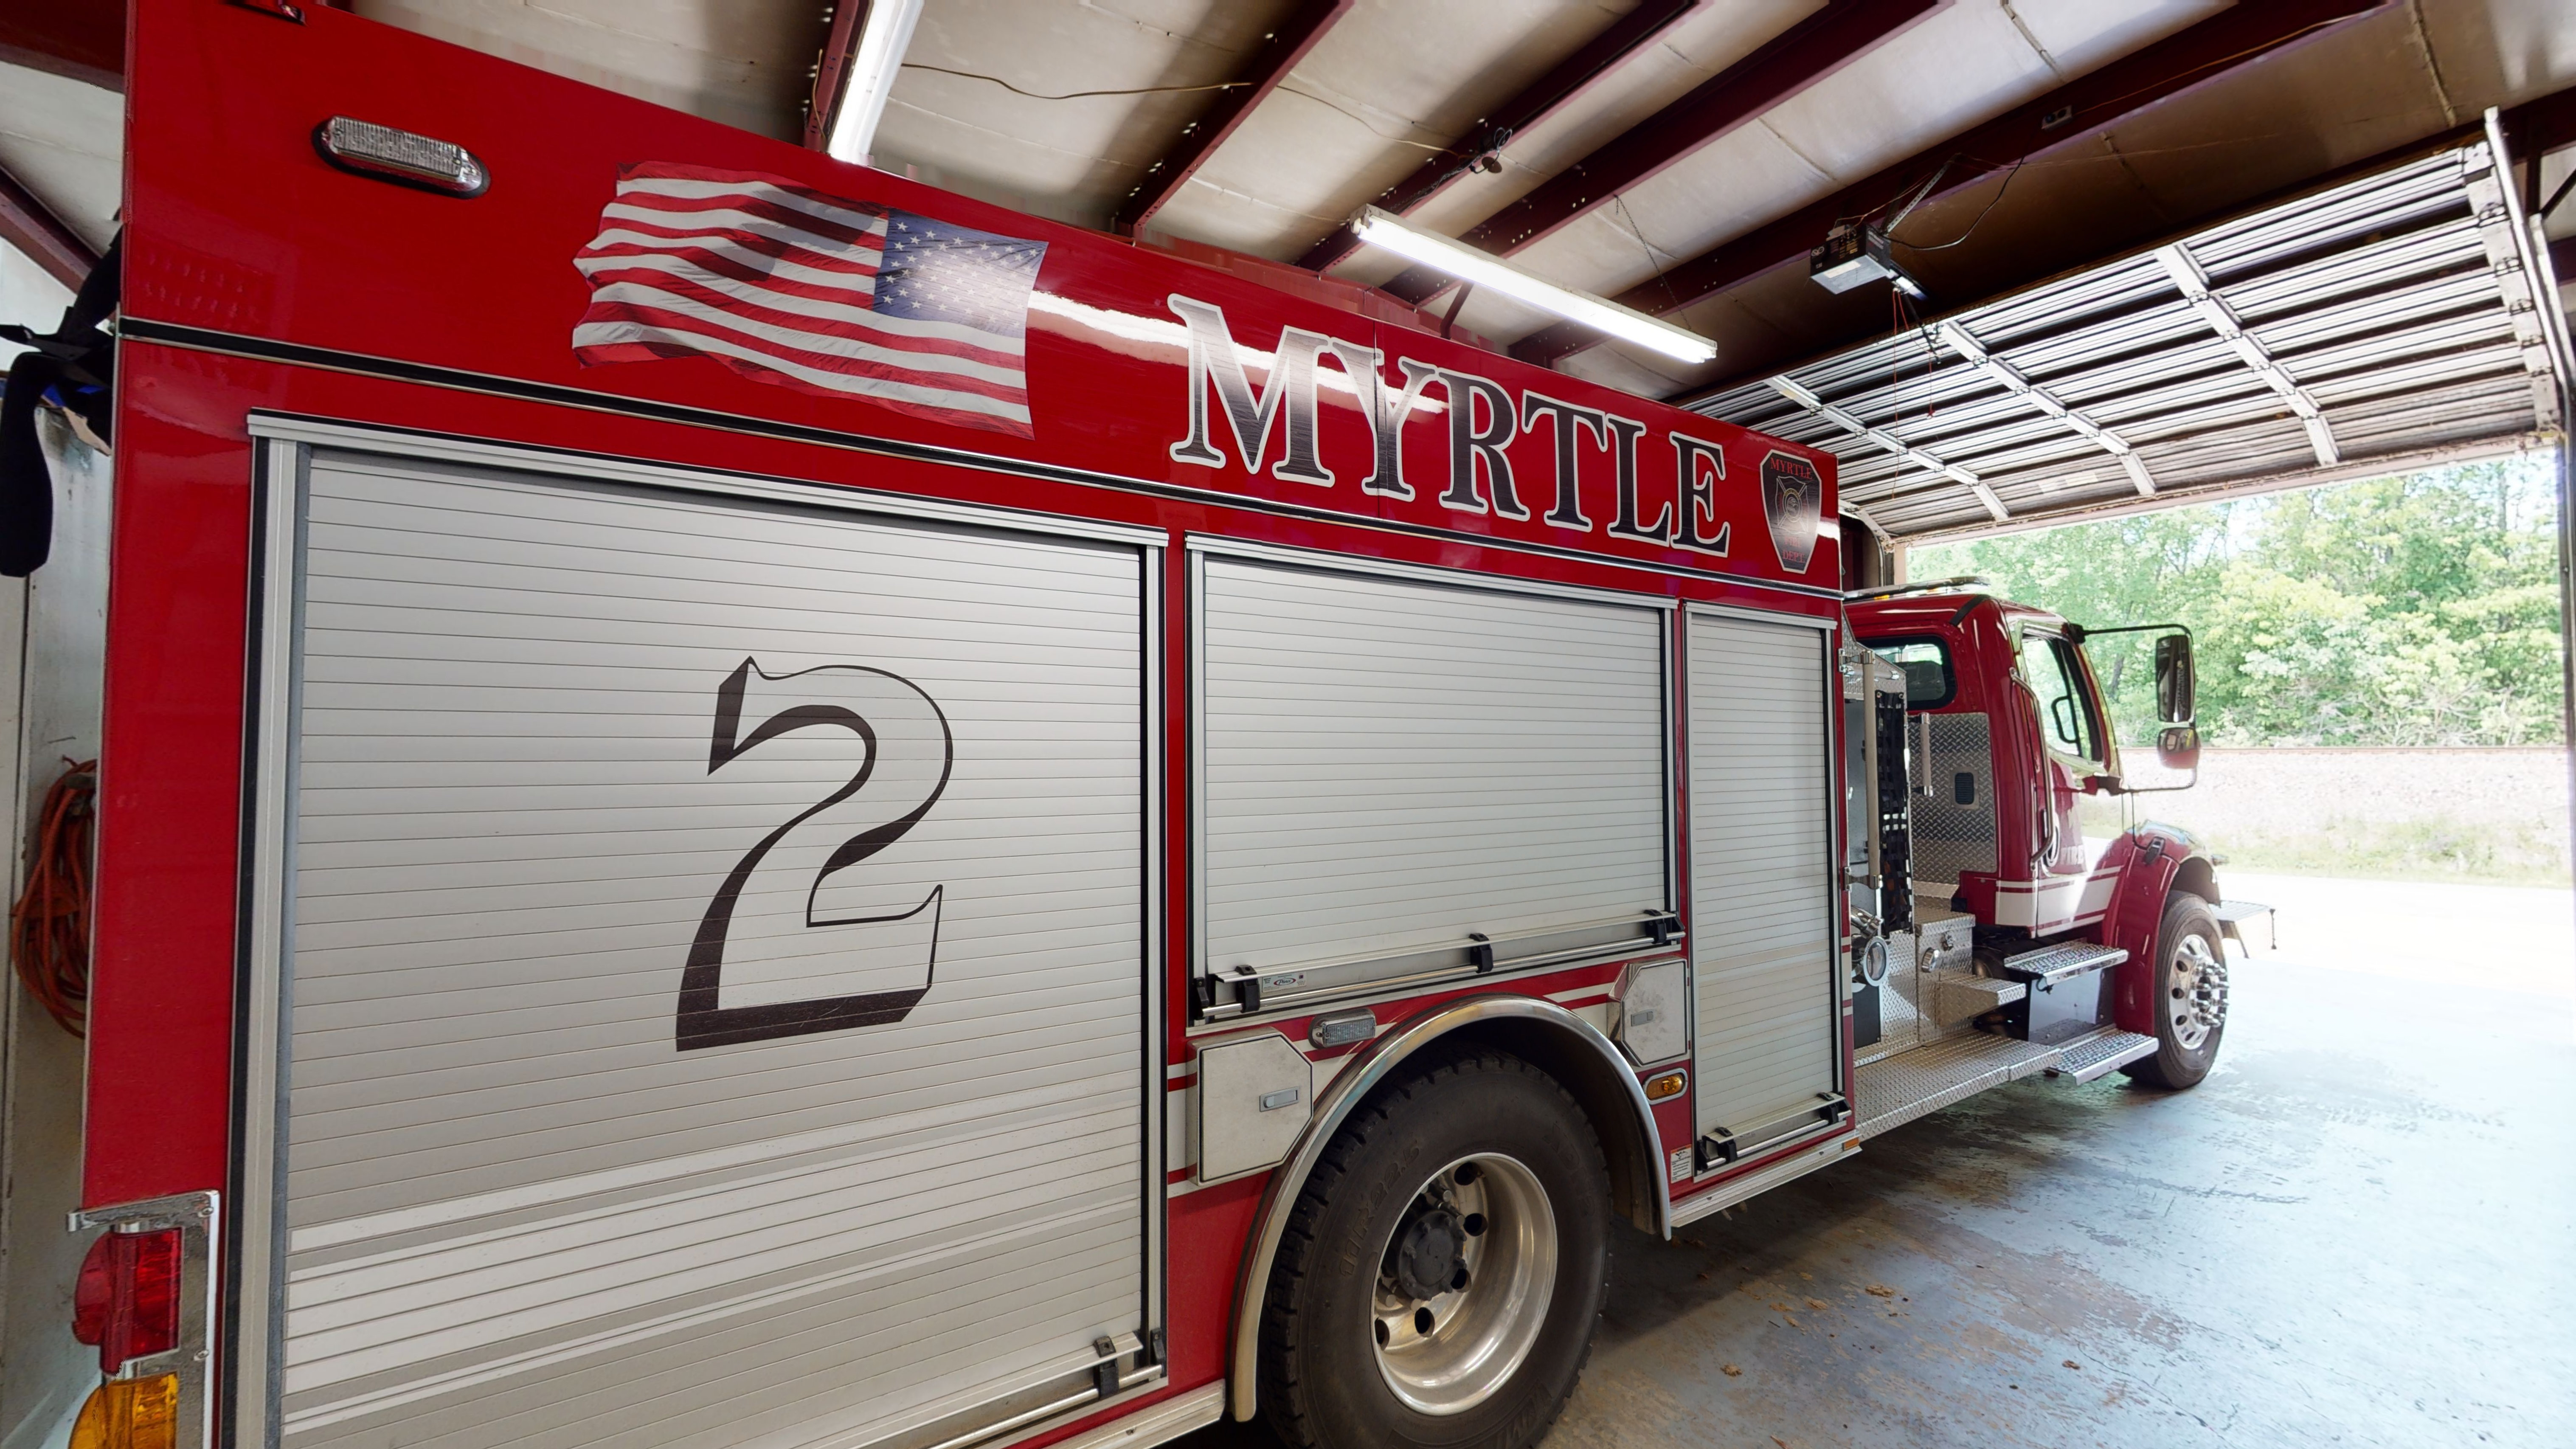 7_Myrtle-FD-Commercial-Pumper-05282021_121102